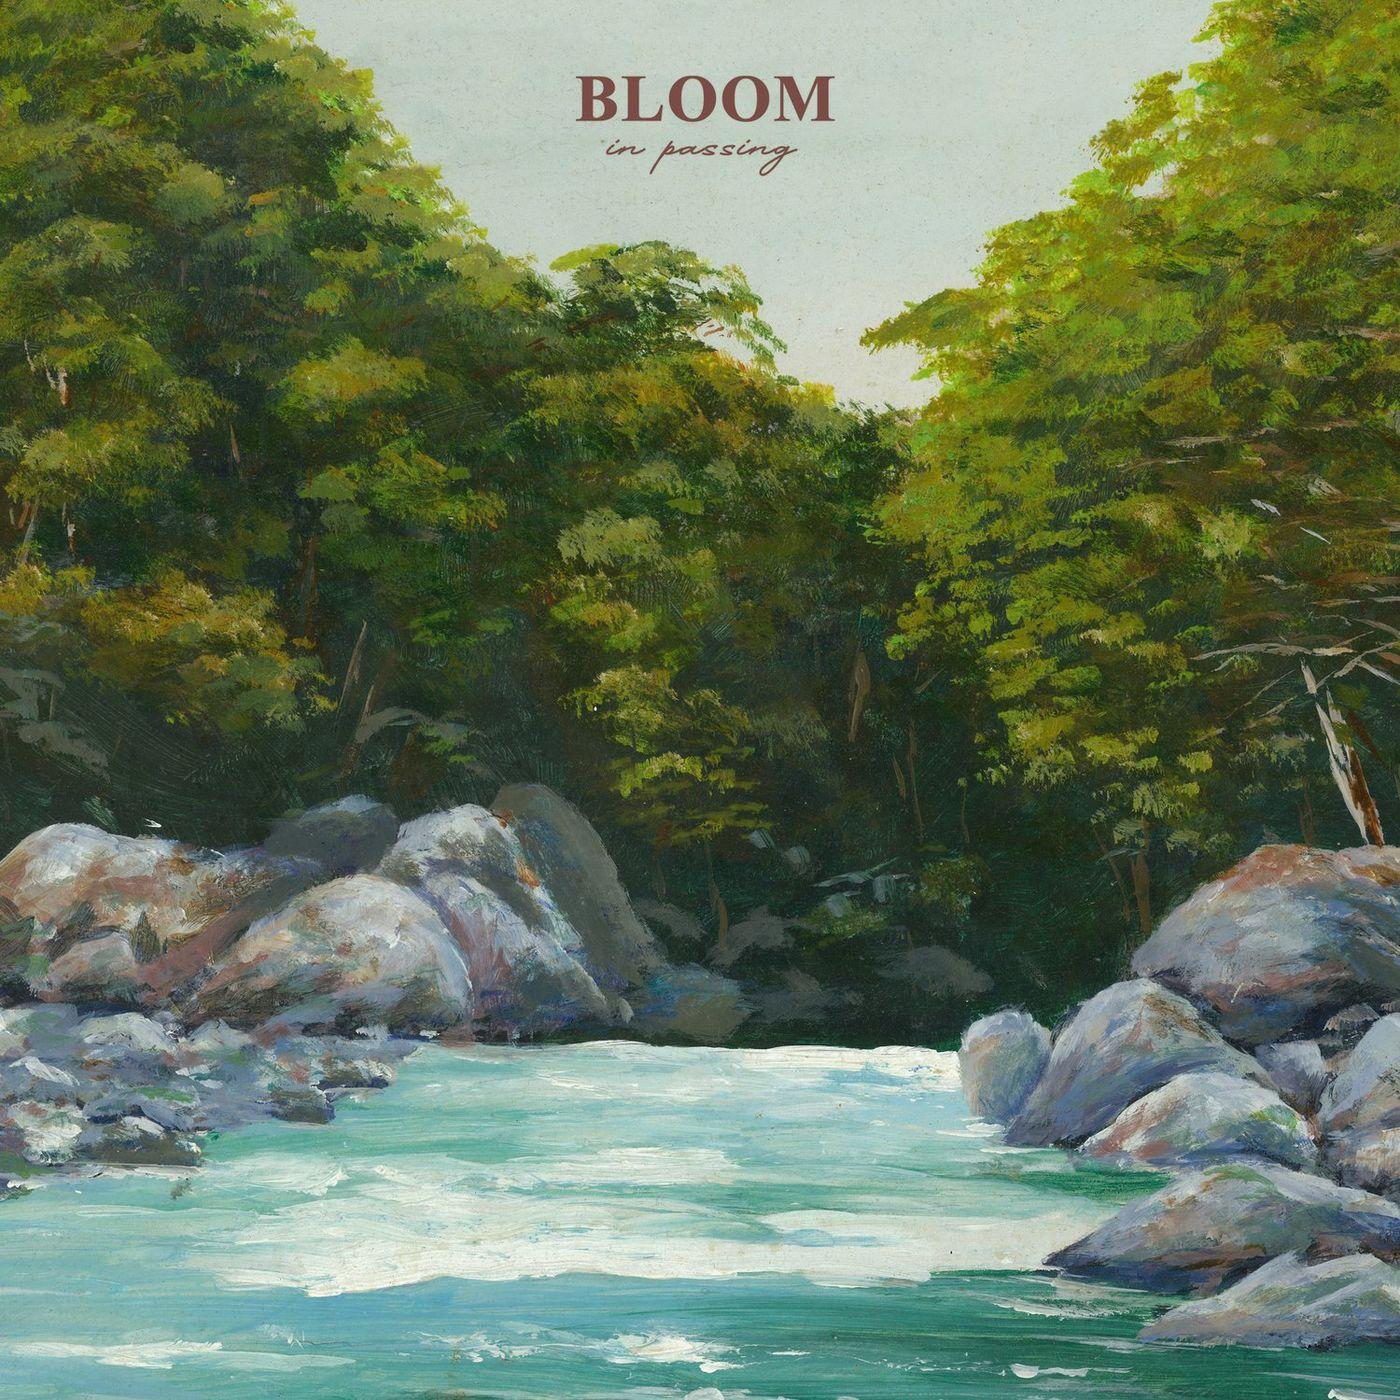 Bloom - Daylight [single] (2020)